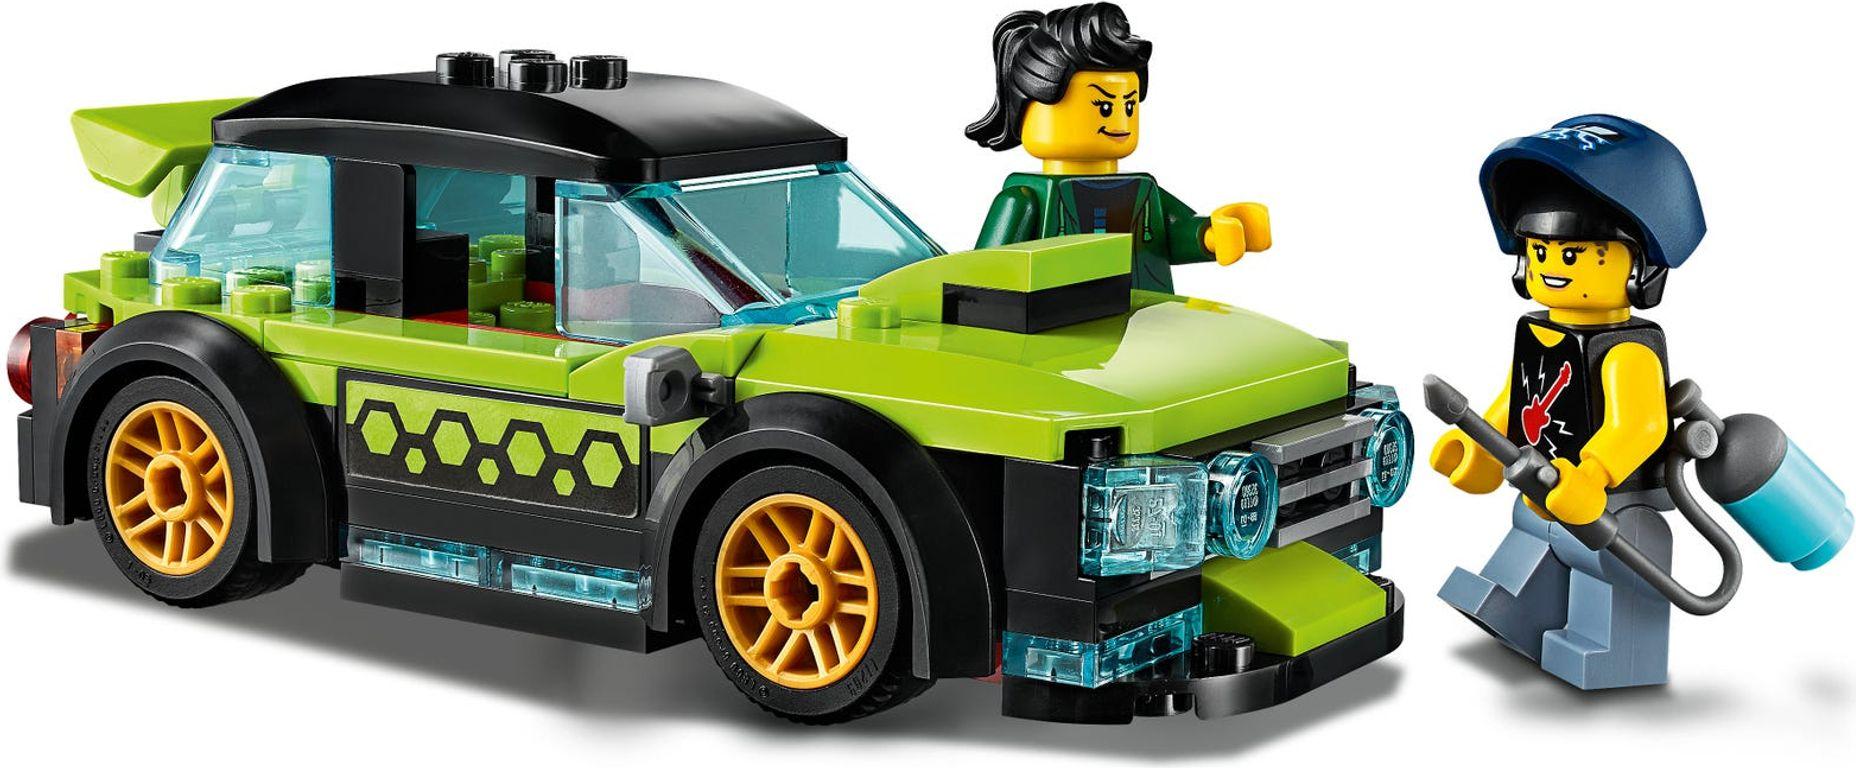 LEGO® City Tuning Workshop minifigures